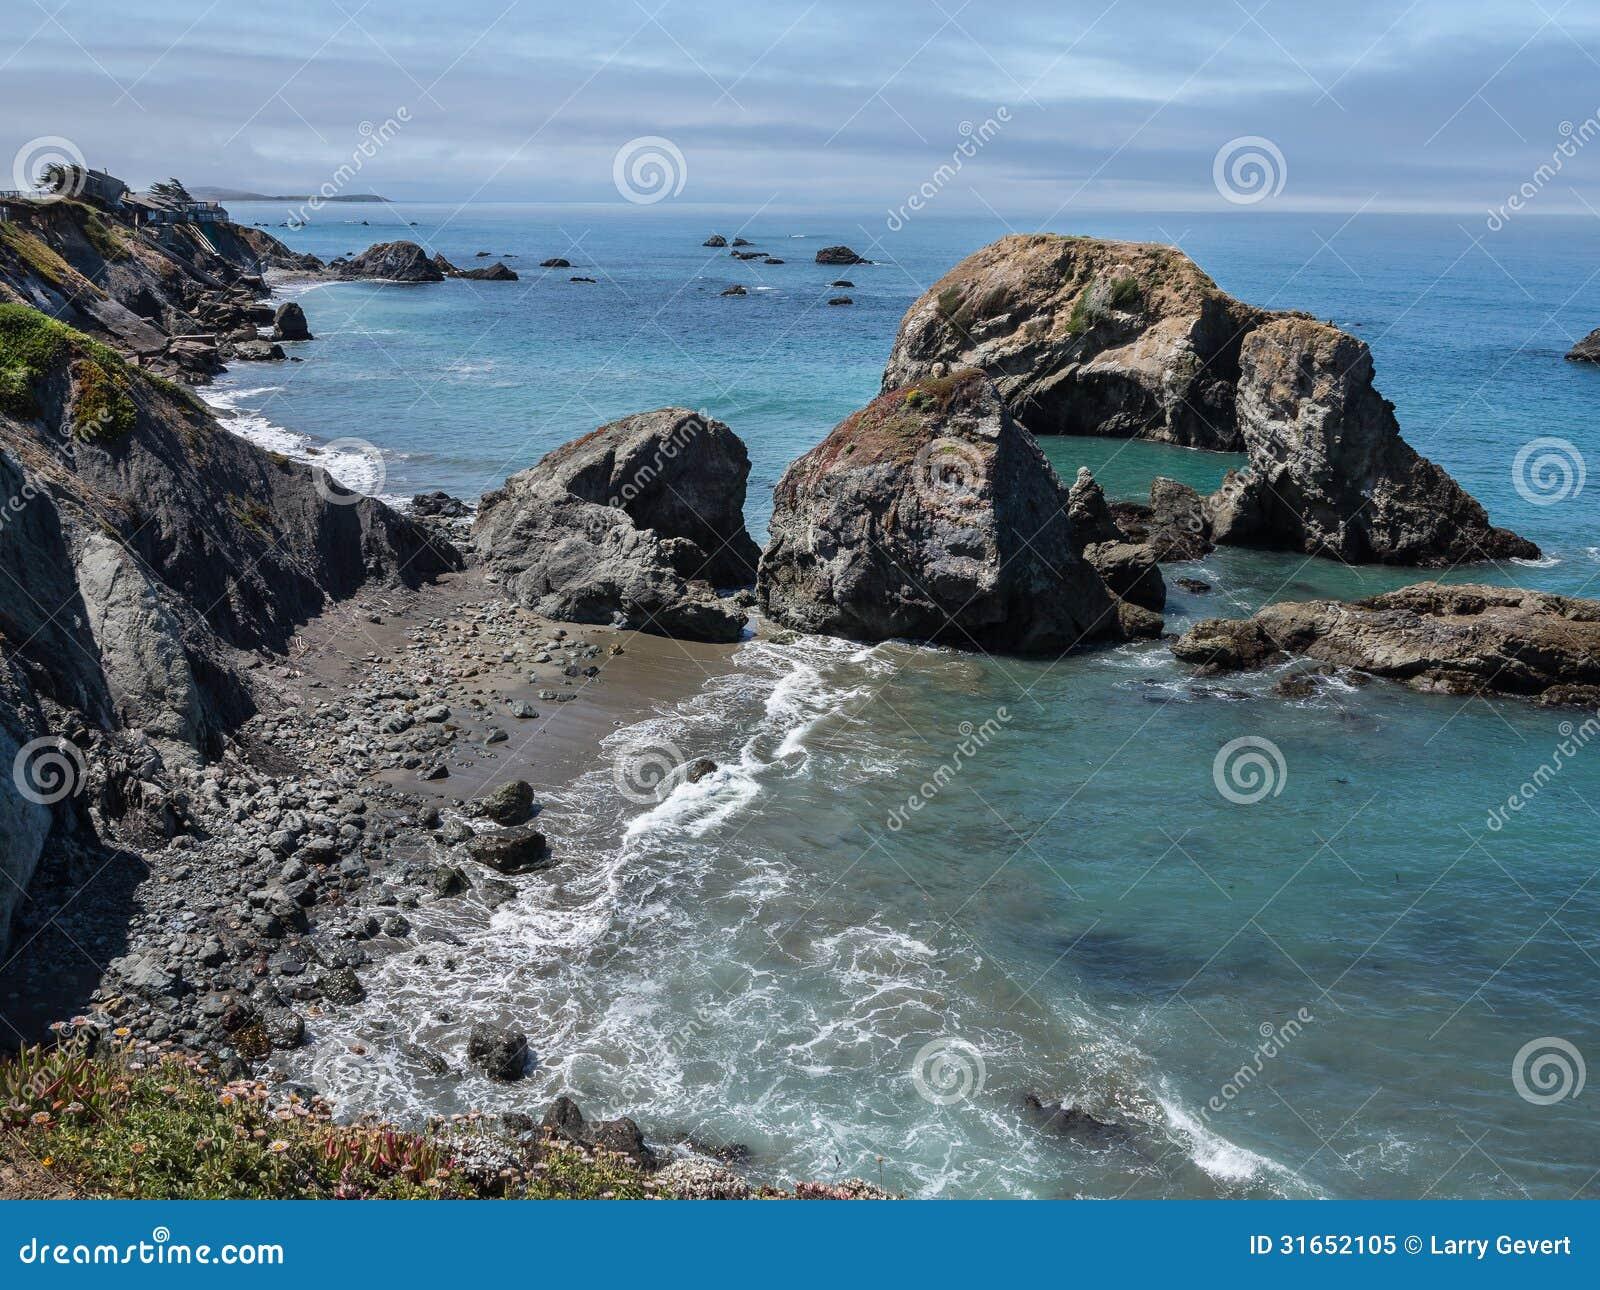 Northern California Coast Travel Blogs